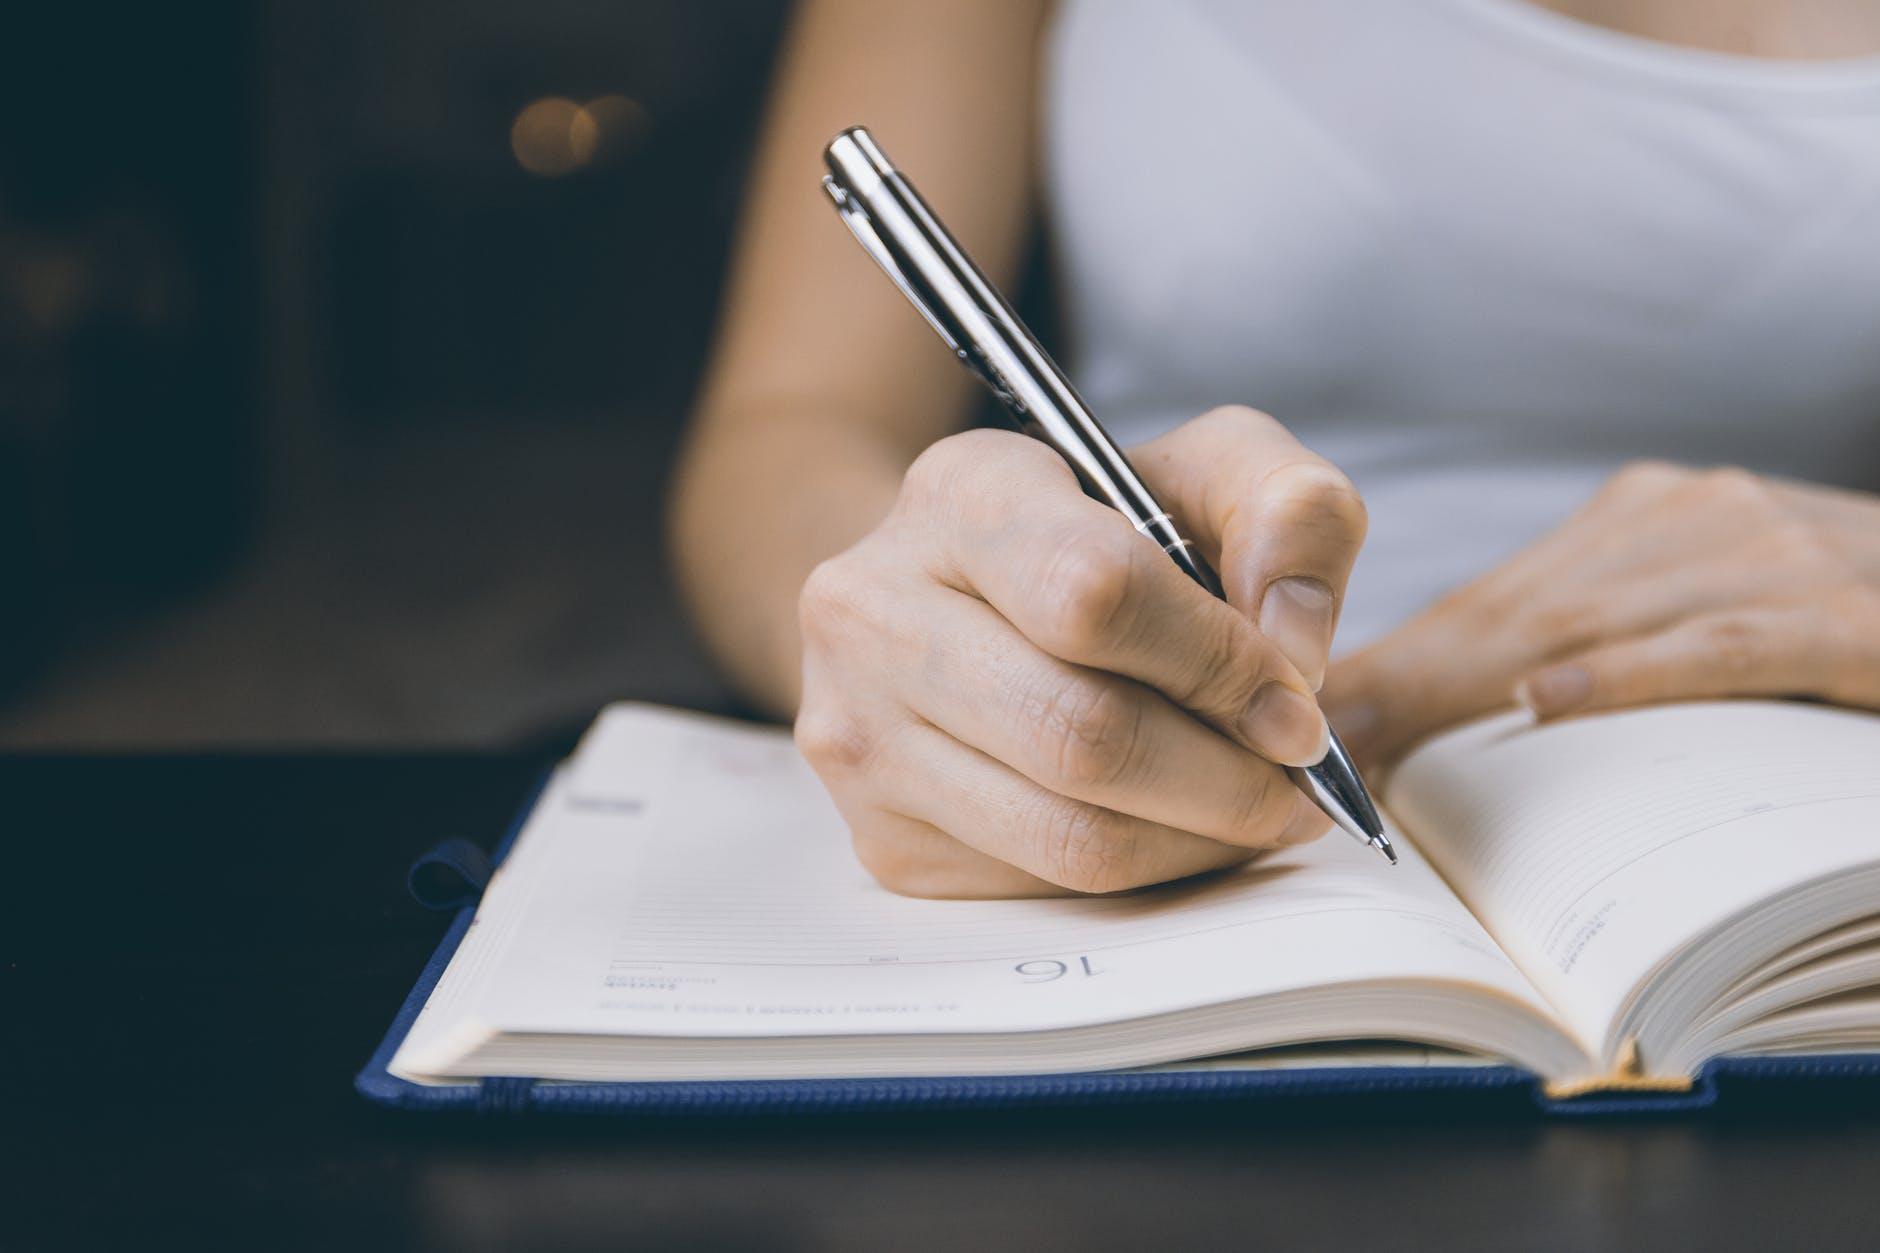 Ce inseamna sa fii un scriitor